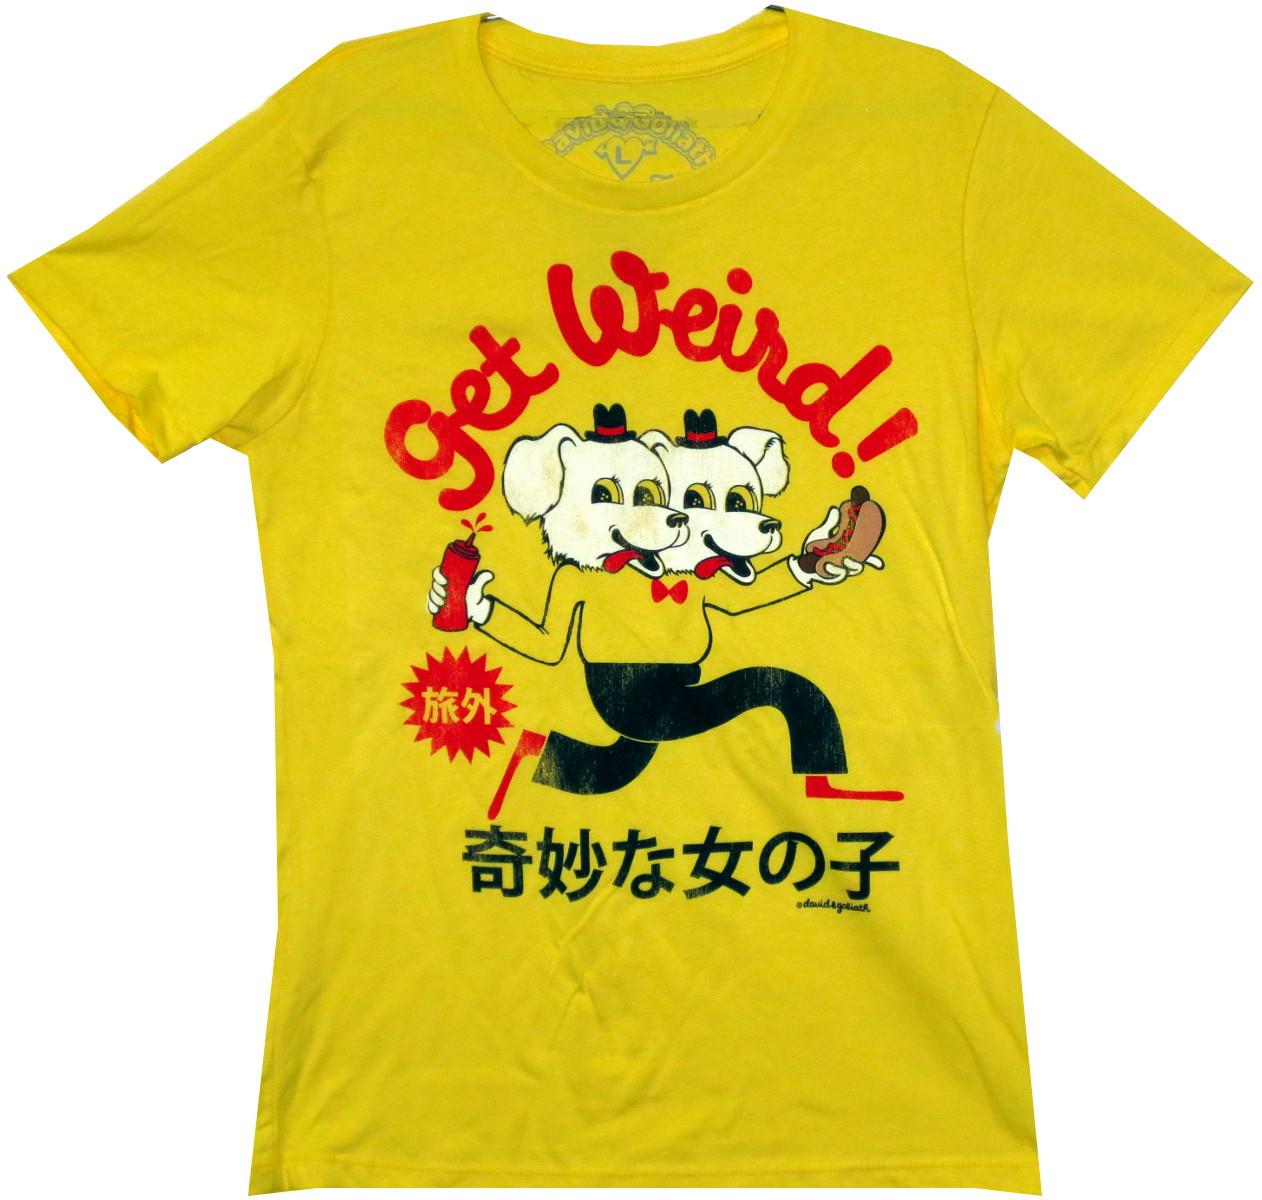 92fca28ee David & Goliath Girls T-Shirt - Get Weird - NerdKungFu